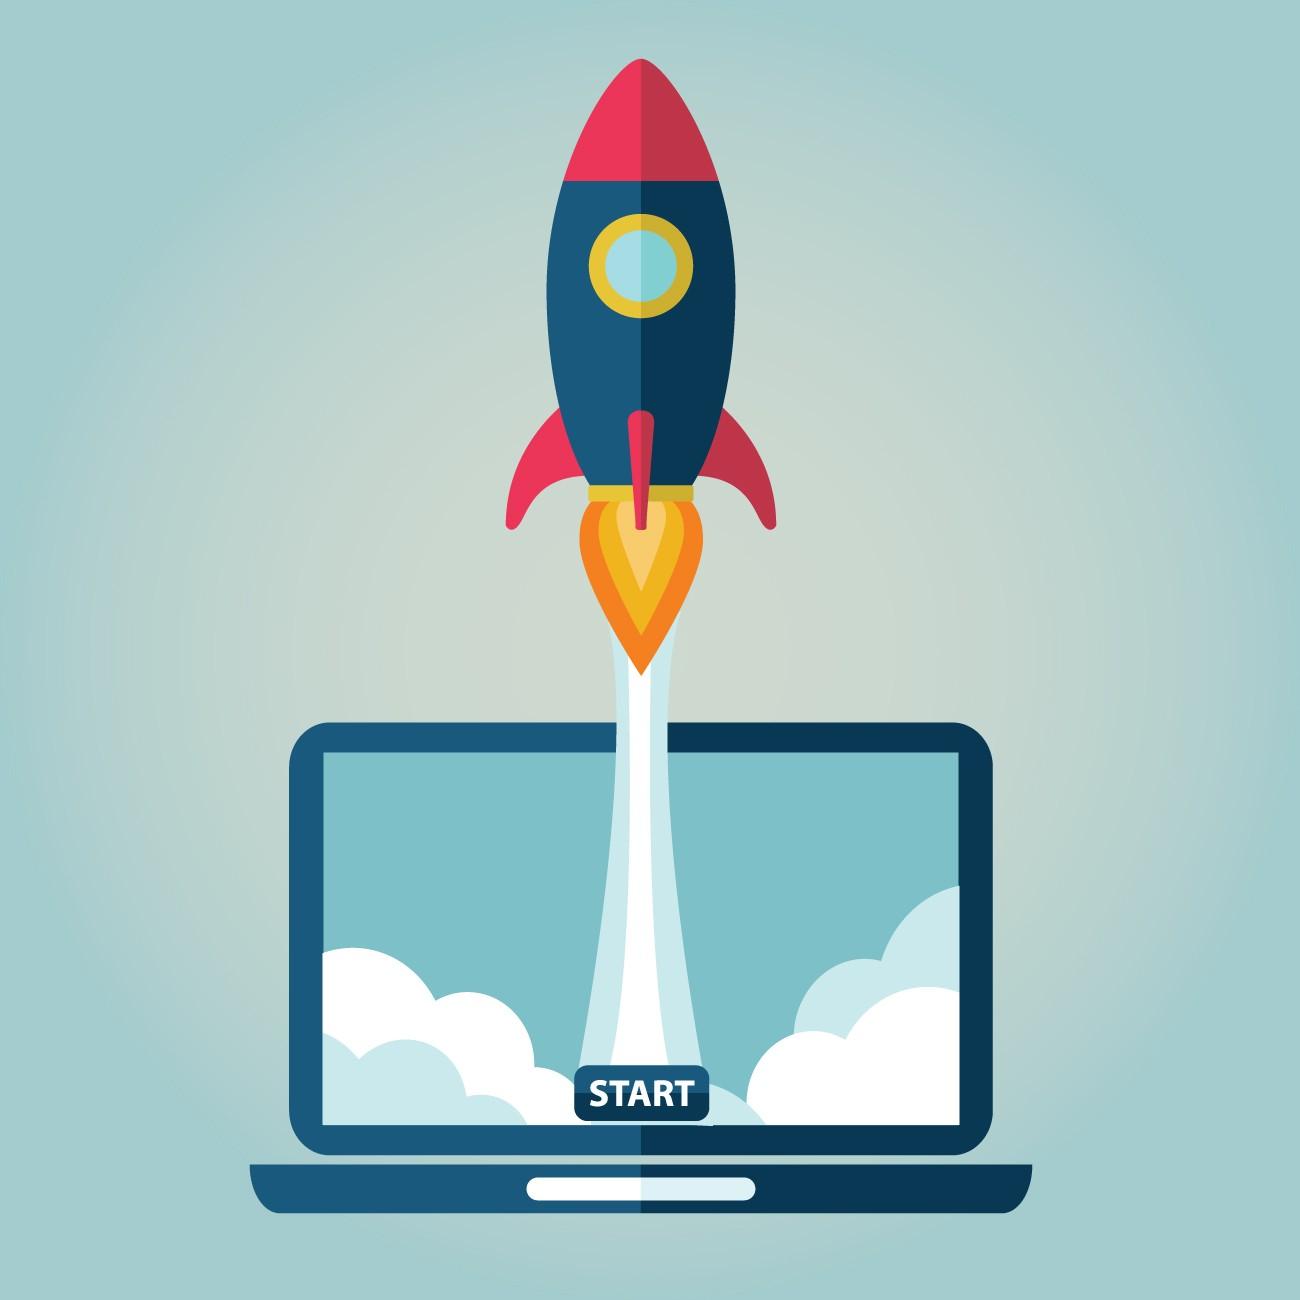 El Social Media Marketing: una carrera de fondo - ExpacioWeb